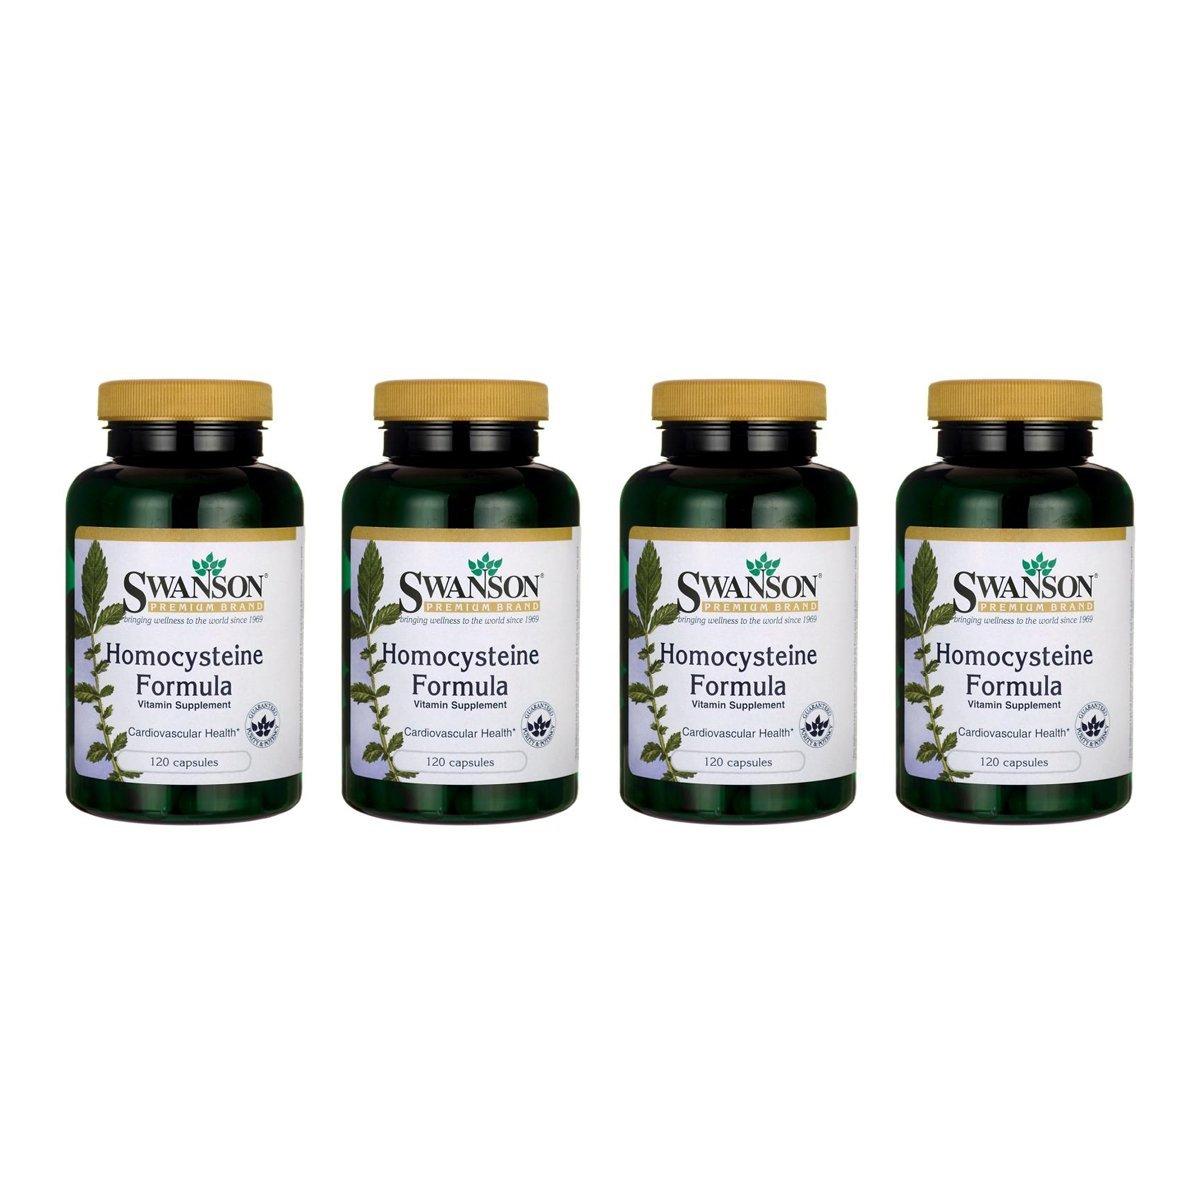 Swanson Homocysteine Formula 120 Caps 4 Pack